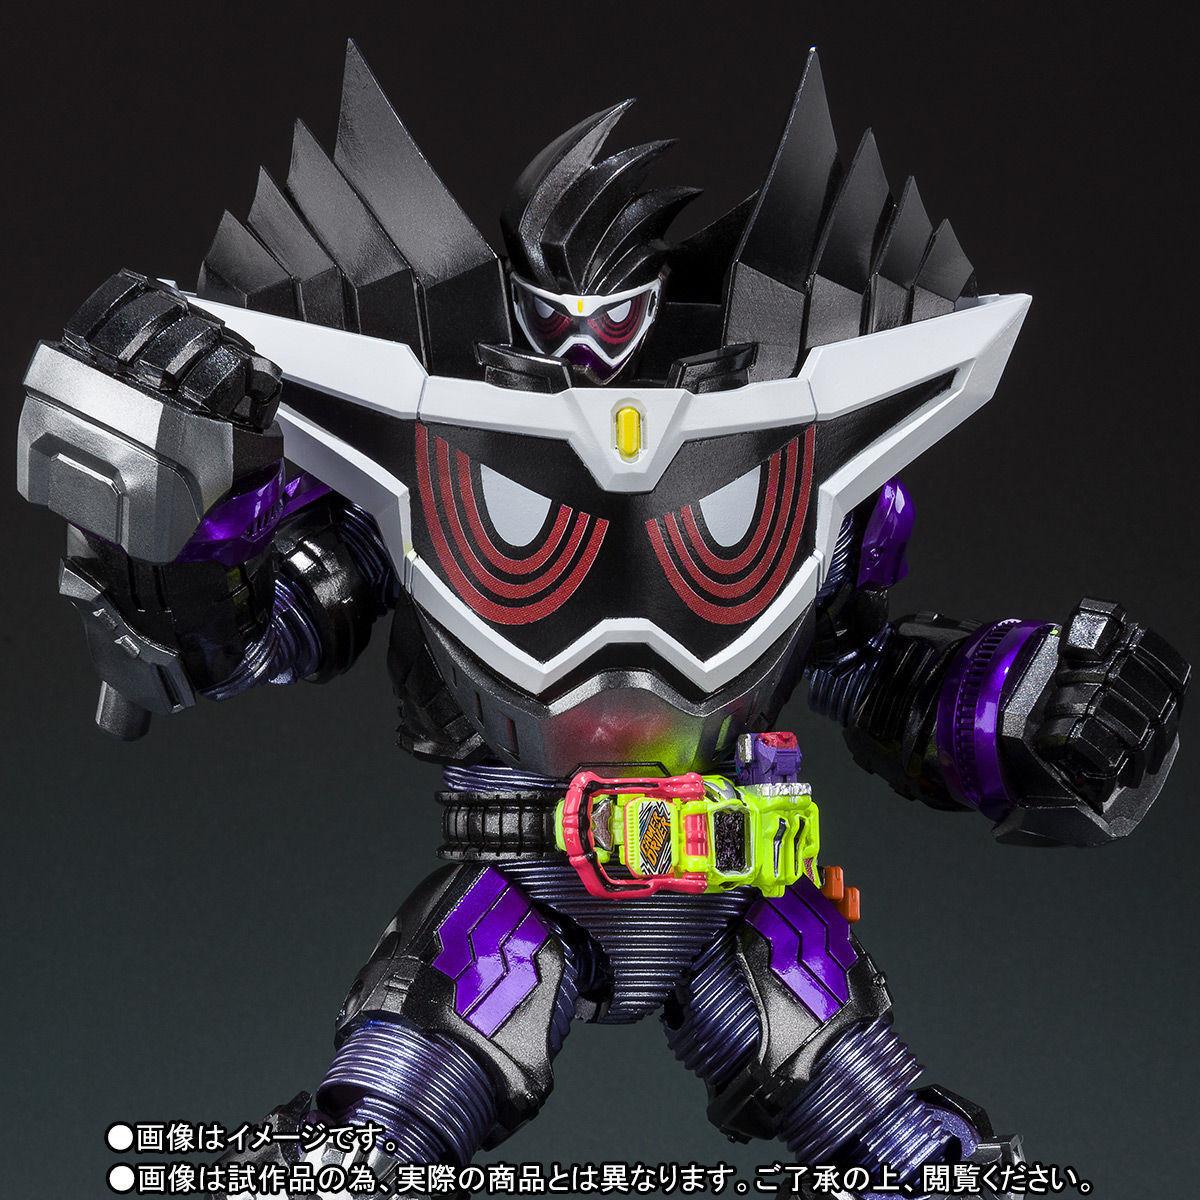 INSTOCK - S.H.Figuarts Kamen Rider Ex-aid GENM Gott Maxium buchstabierenr Level 1000000000